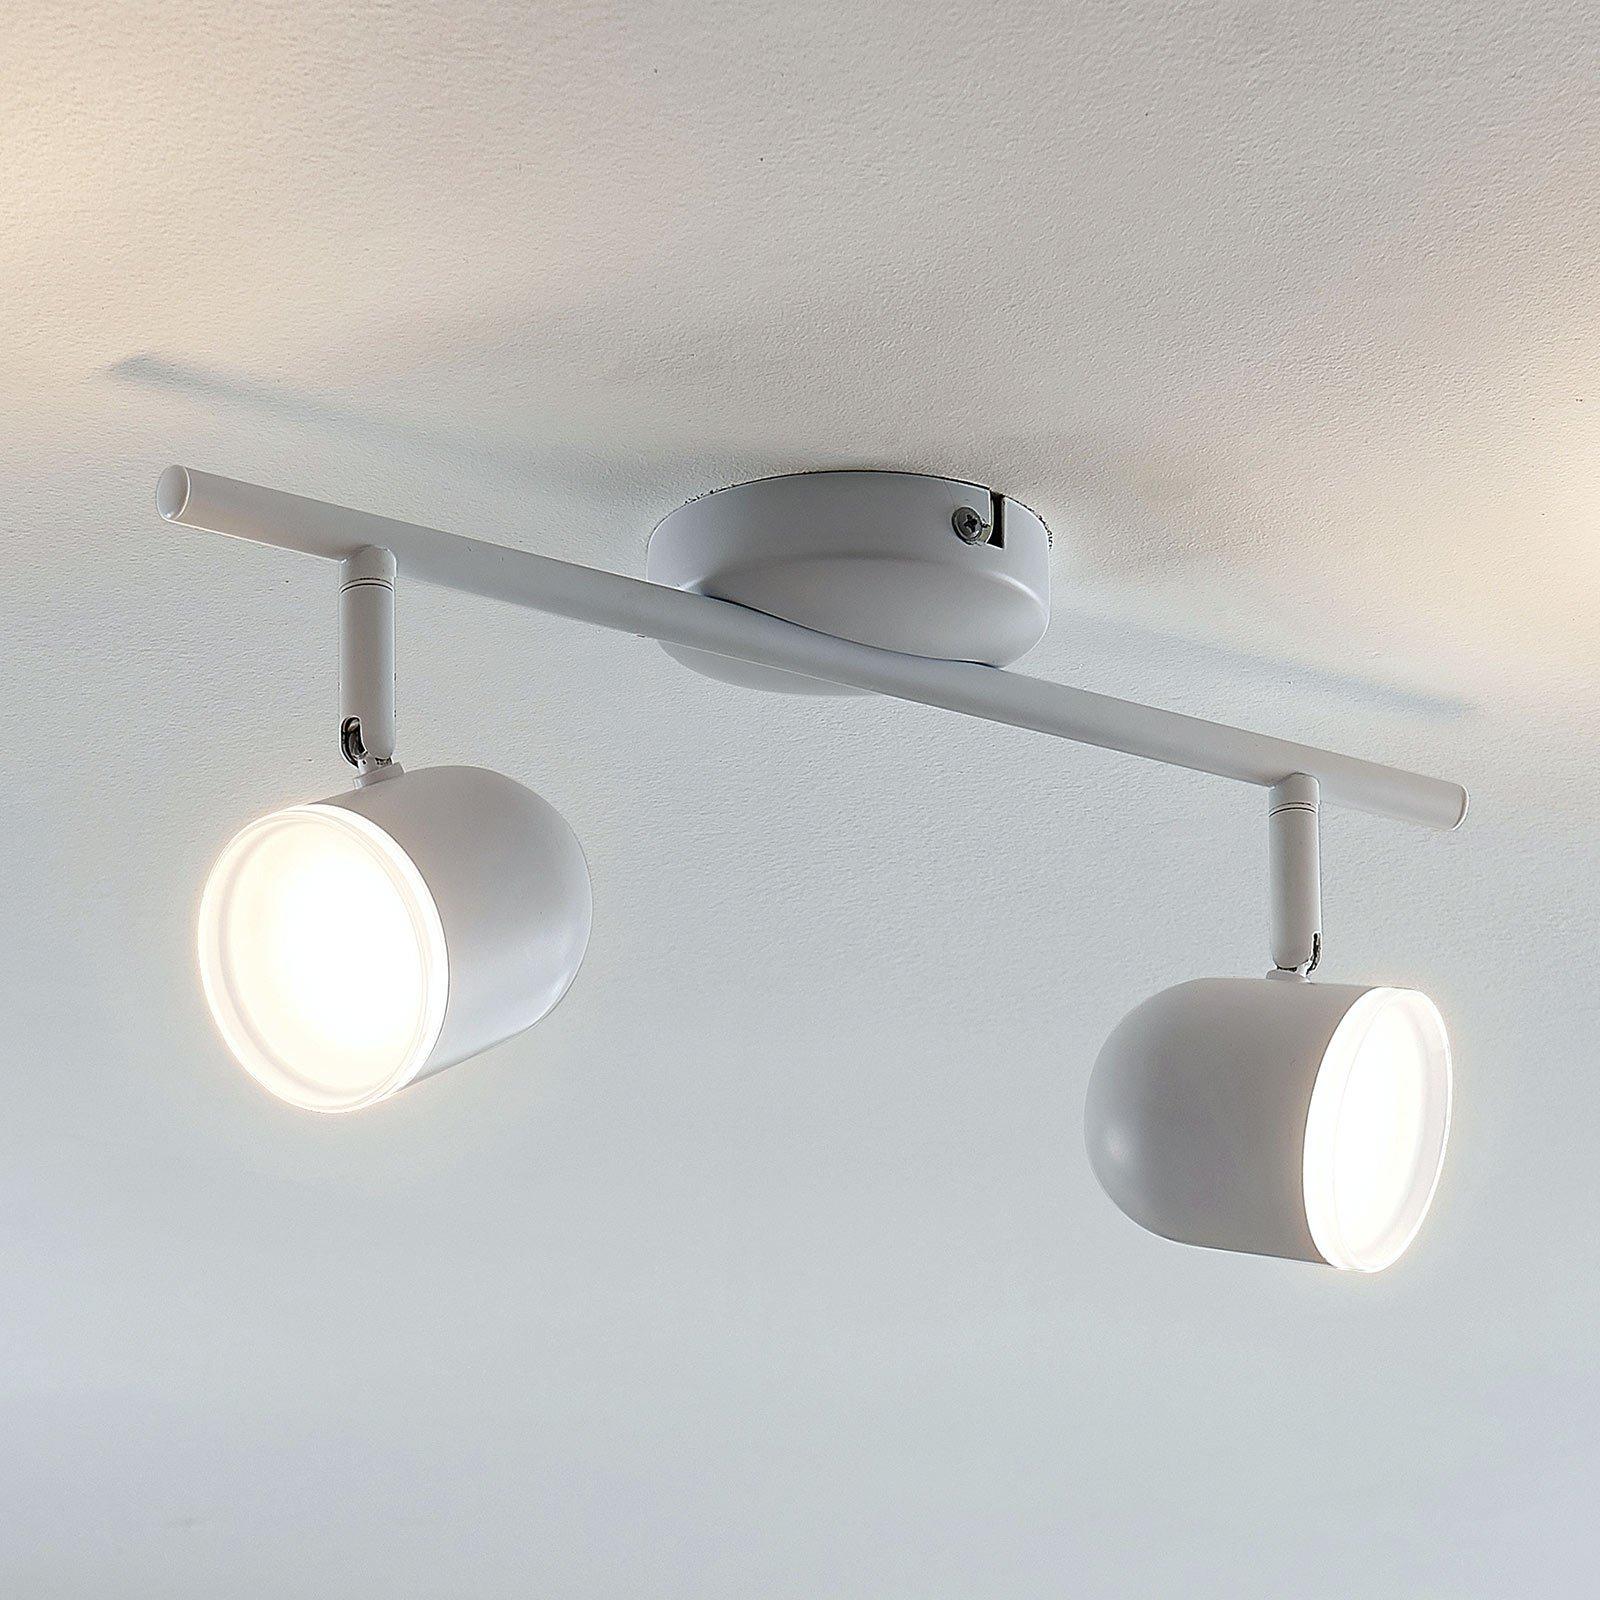 LED-taklampe Ilka justerbar, hvitt, 2 lyskilder